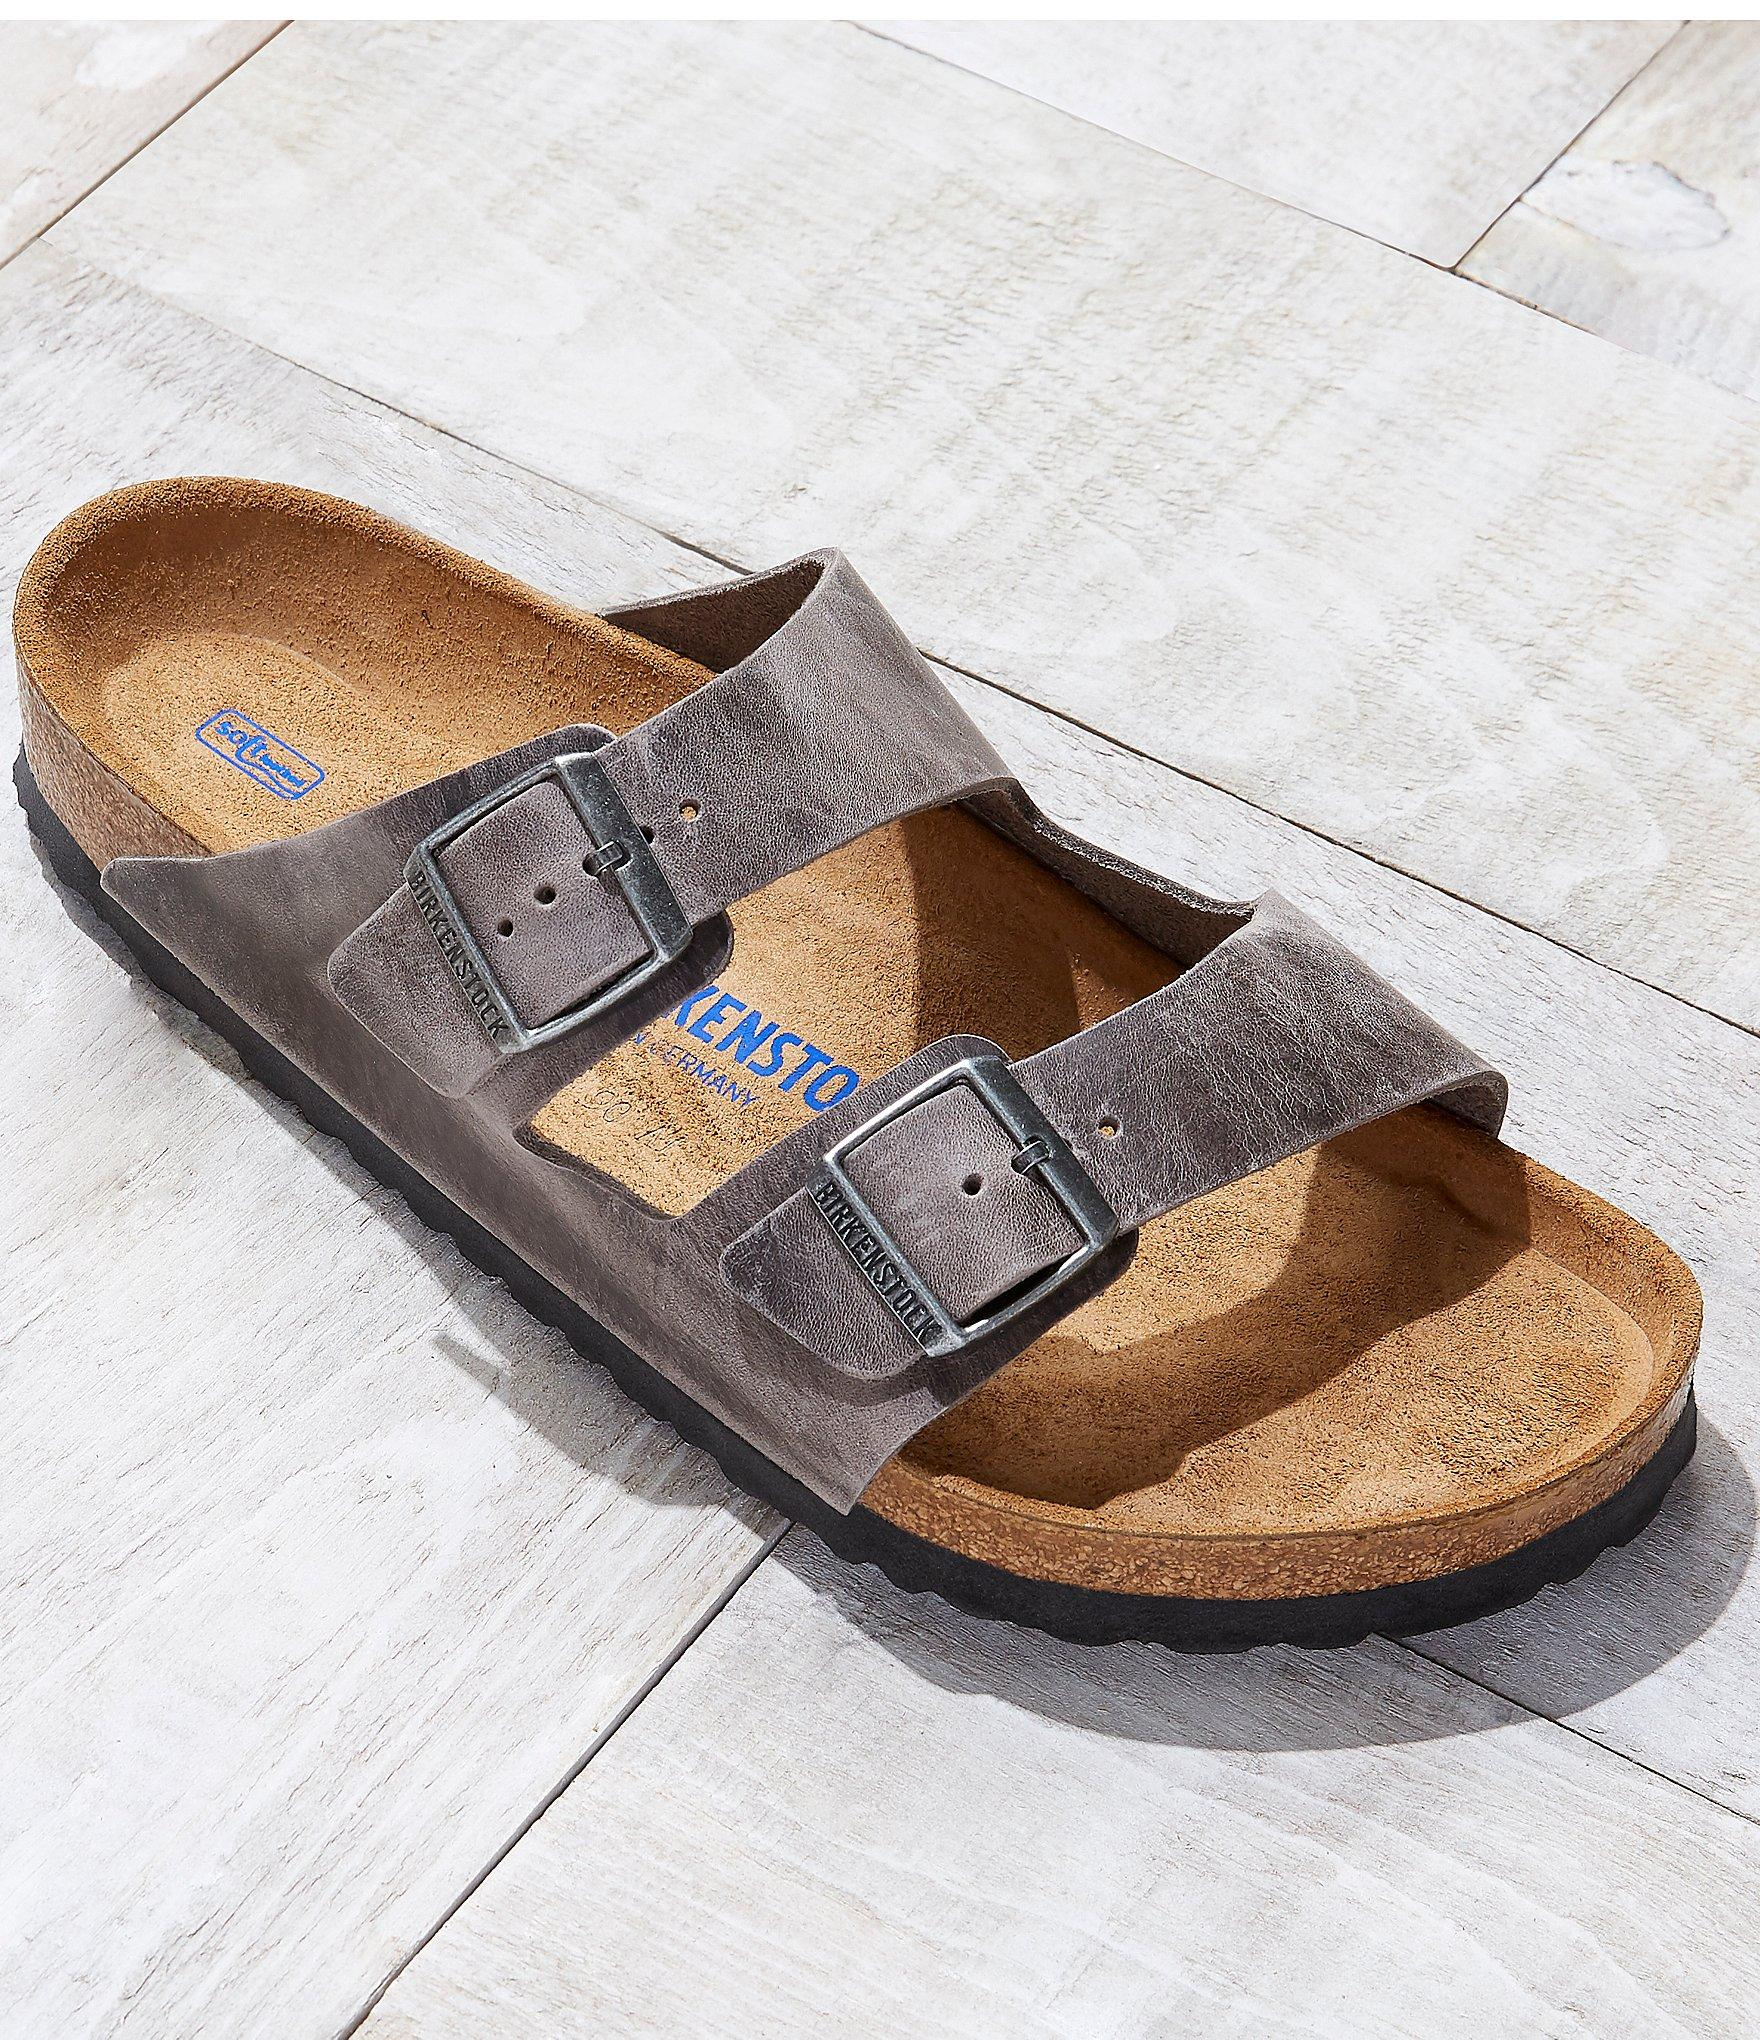 011be365bd9f Lyst - Birkenstock Arizona Men ́s Oiled Suede Soft Footbed Slip On ...